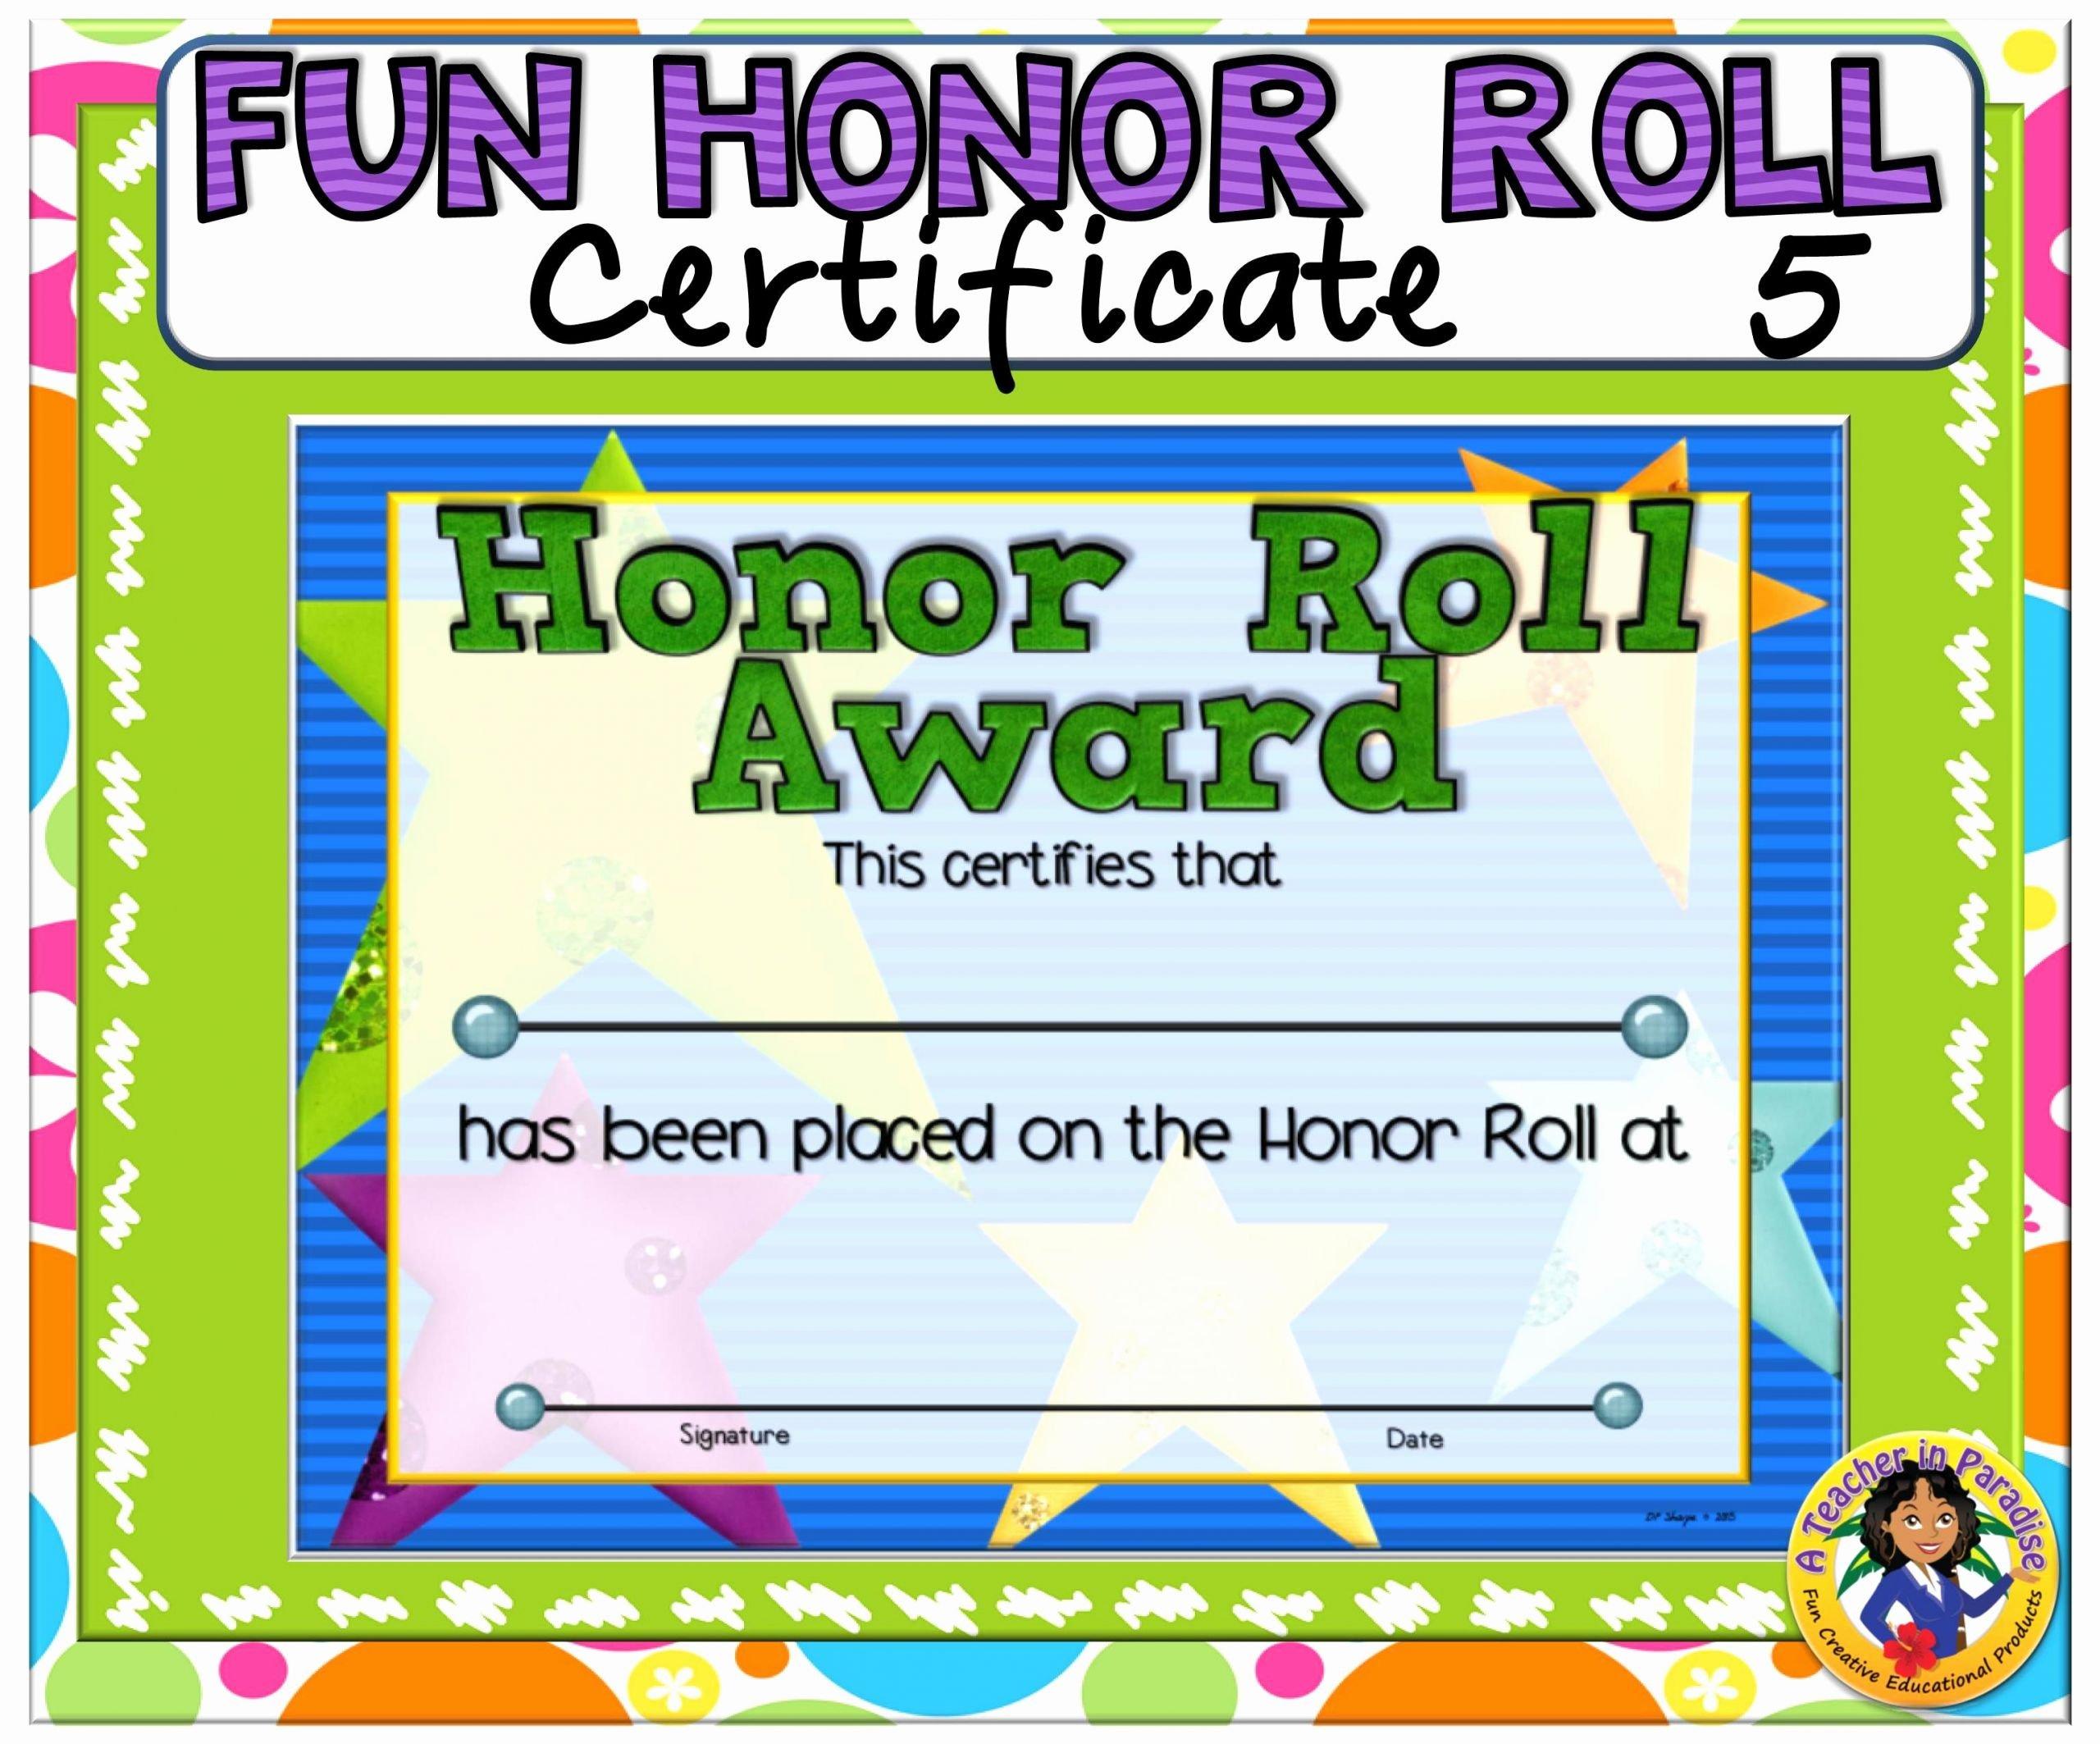 Free Printable Honor Roll Certificates Elegant Certificate Fun Honor Roll 5